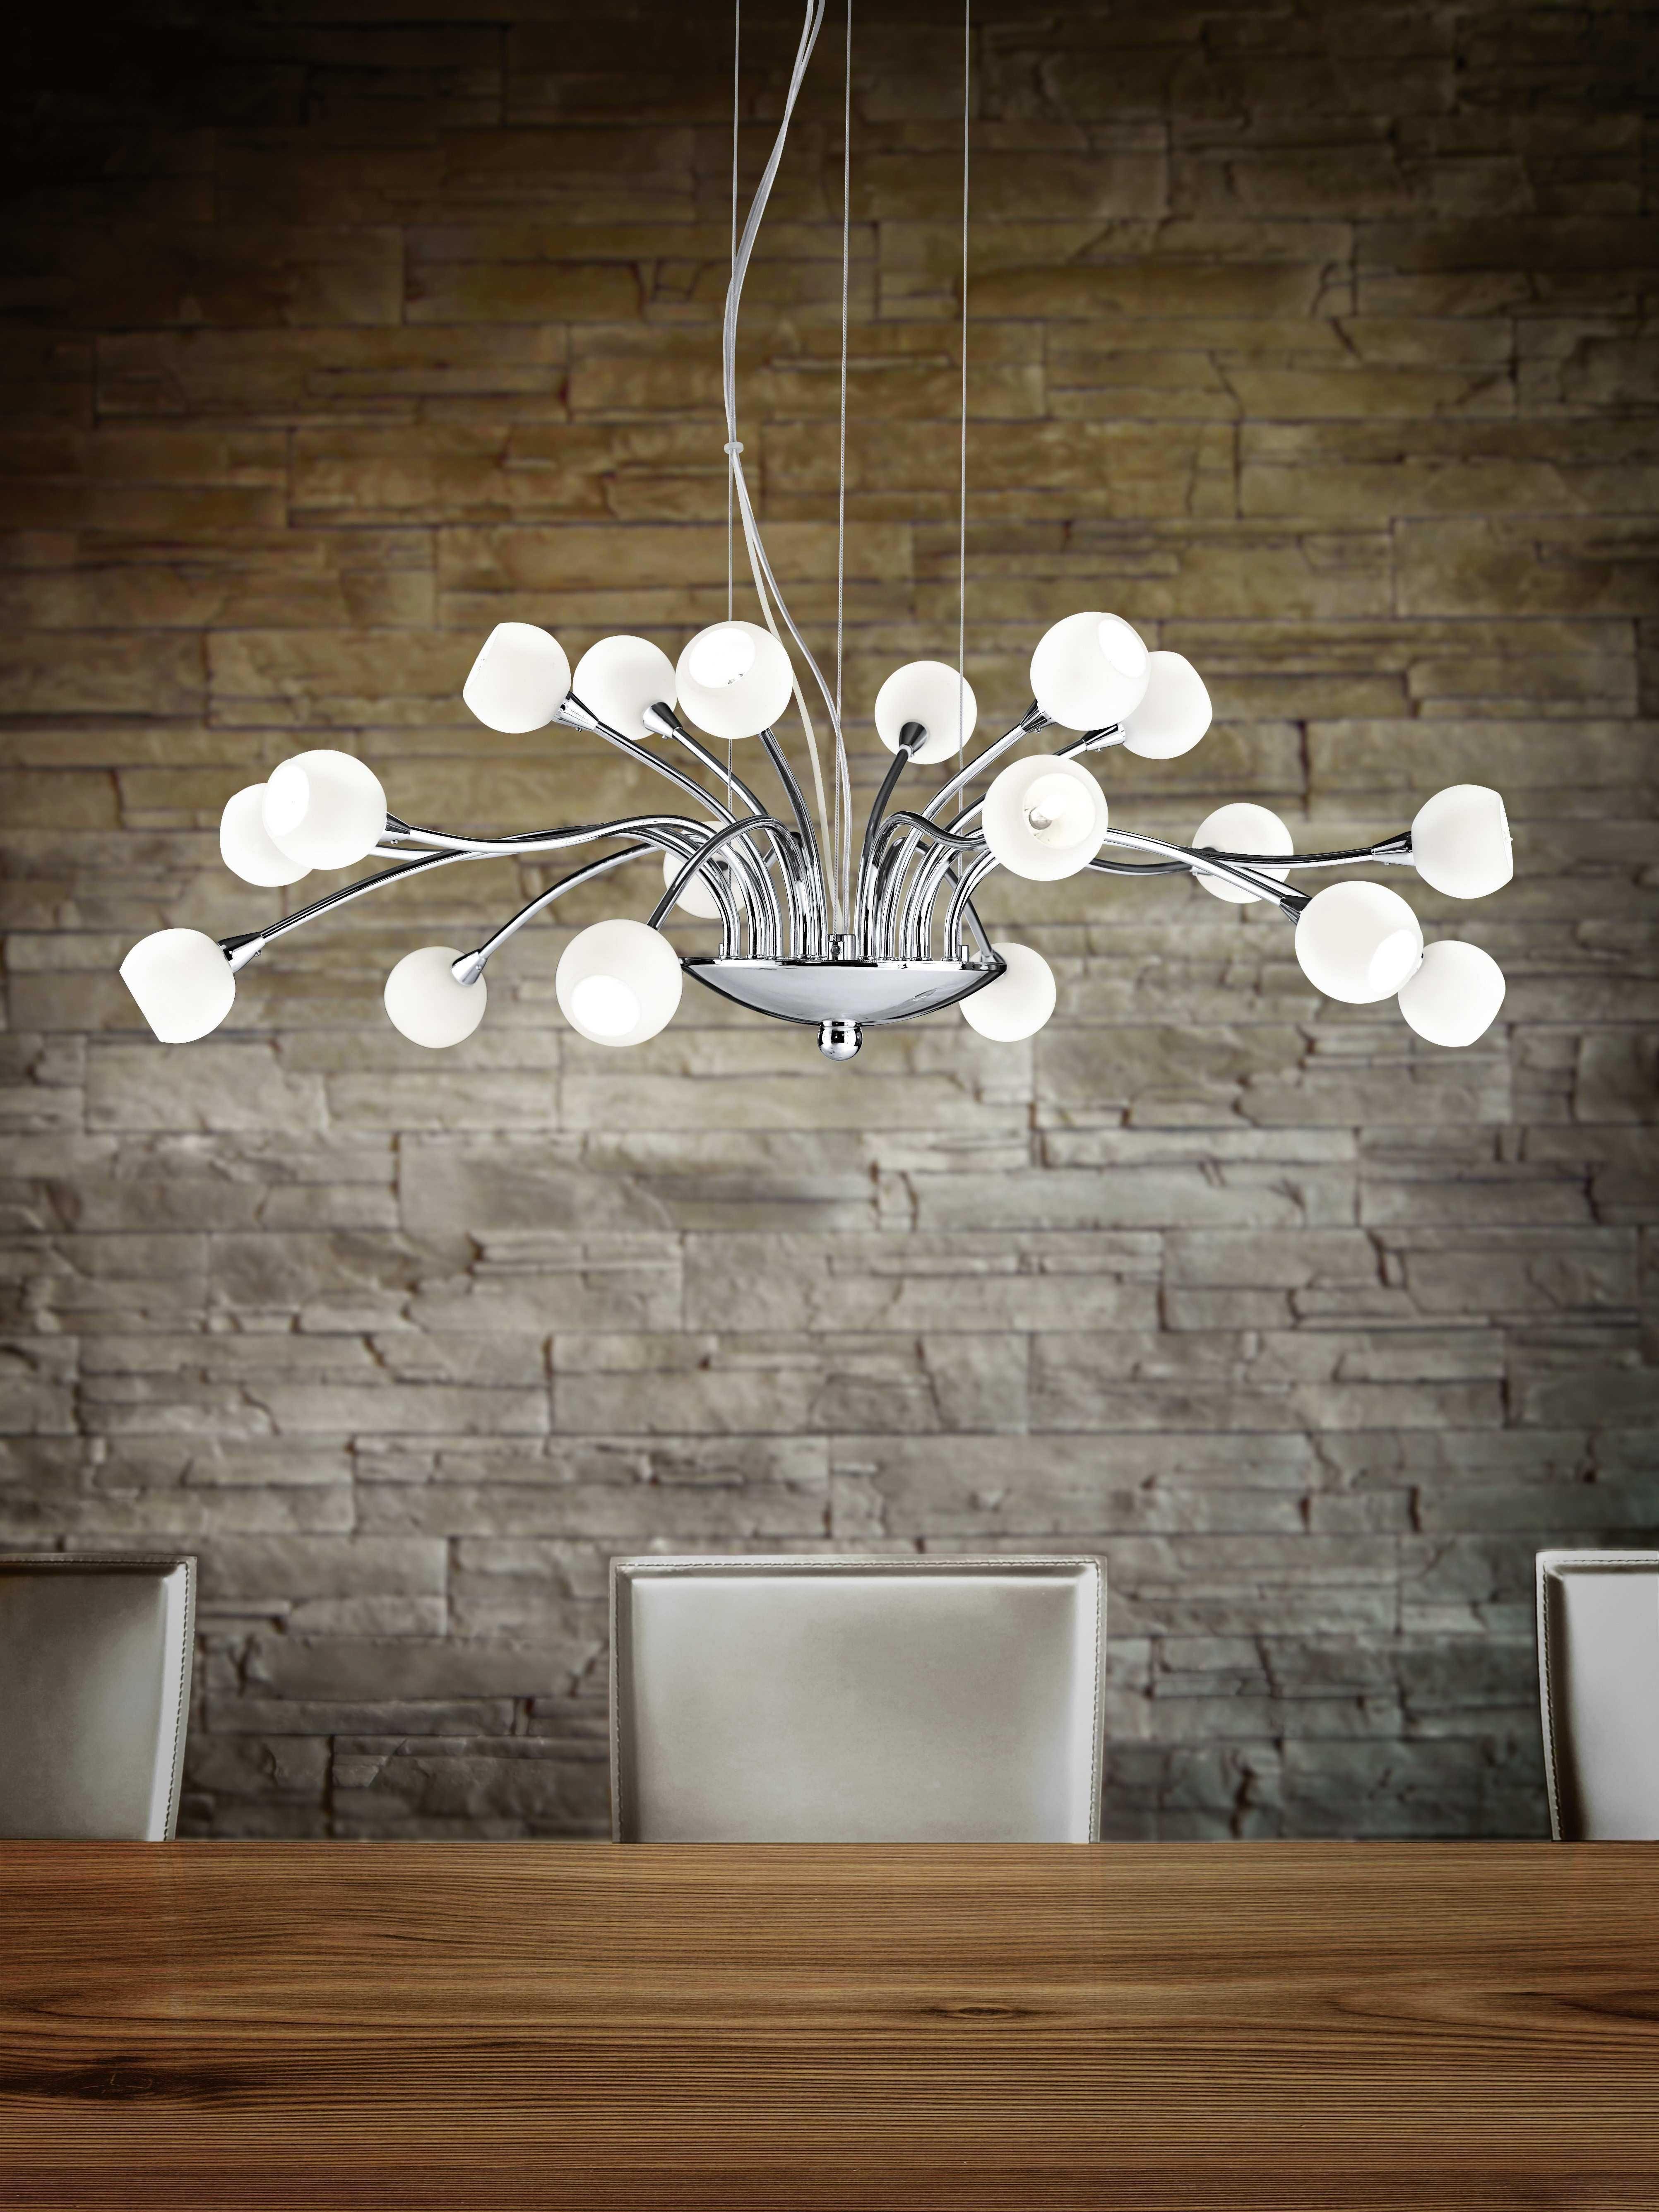 Elegant rustic pendant lighting for dining room home decor ideas